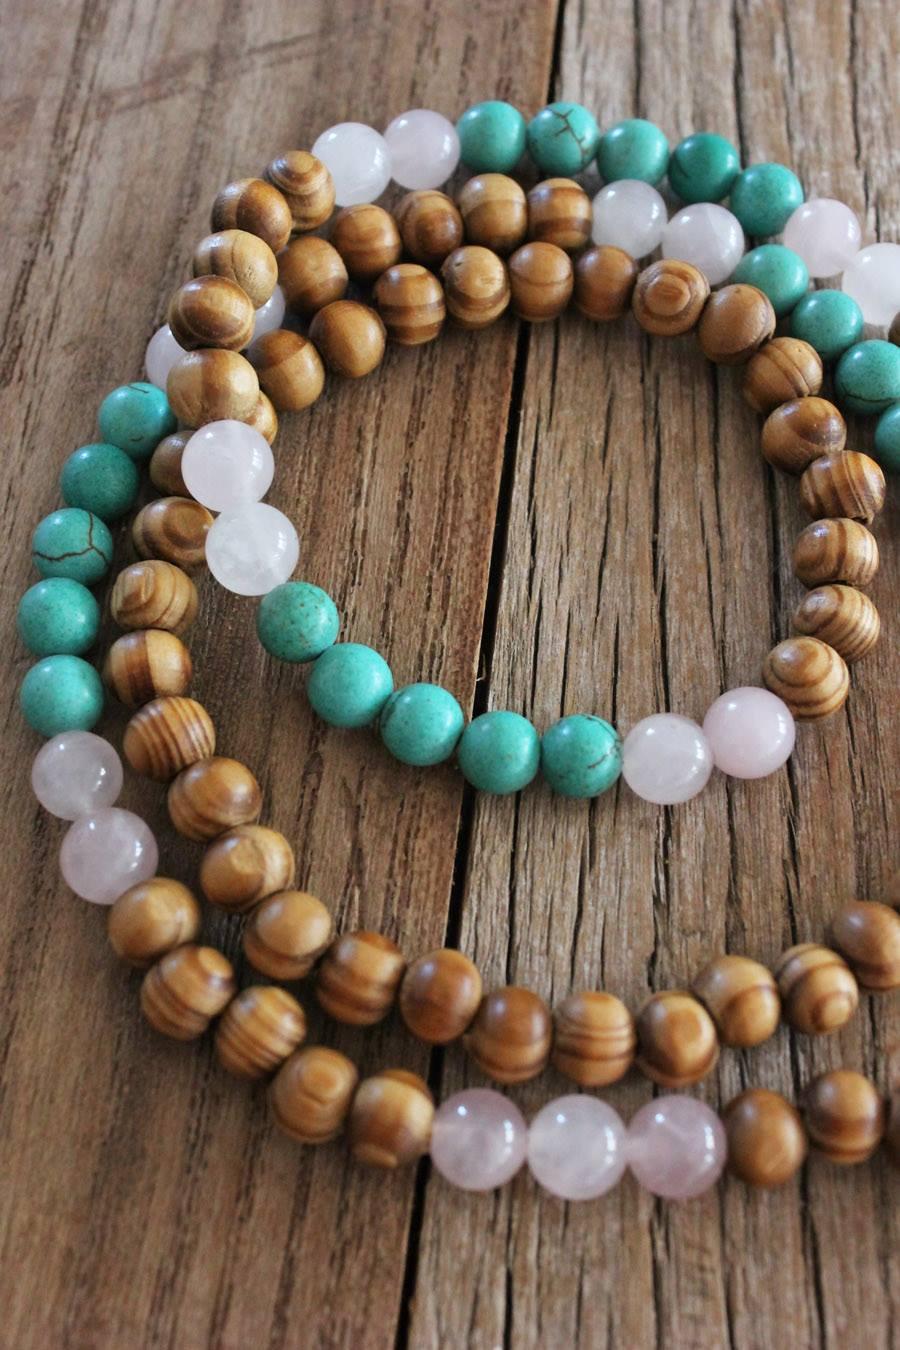 Tibetan wood, Turquoise Howlite and Rose Quartz